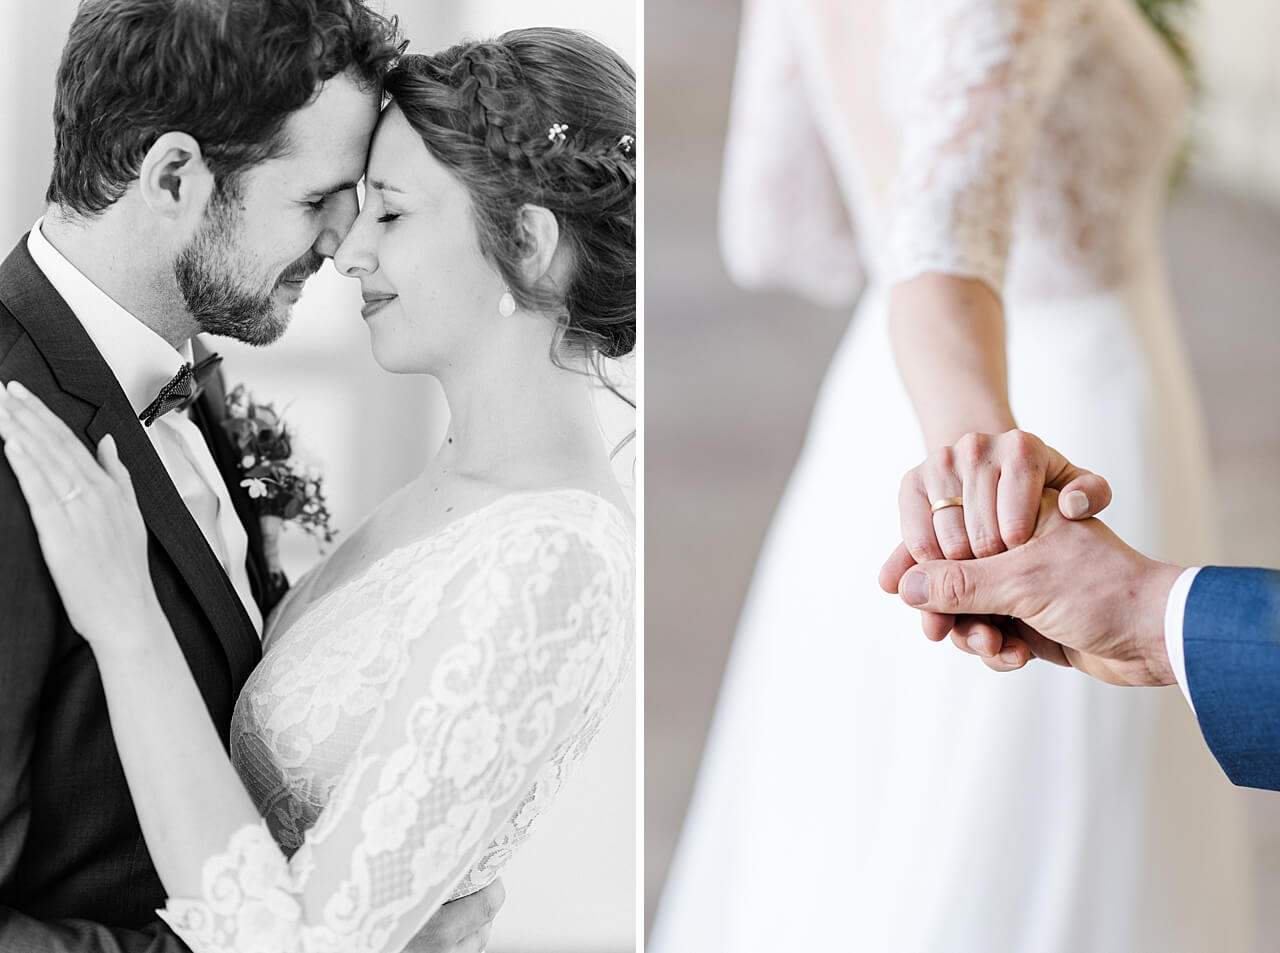 Rebecca Conte Fotografie: Romantische Hochzeitsfotos 09